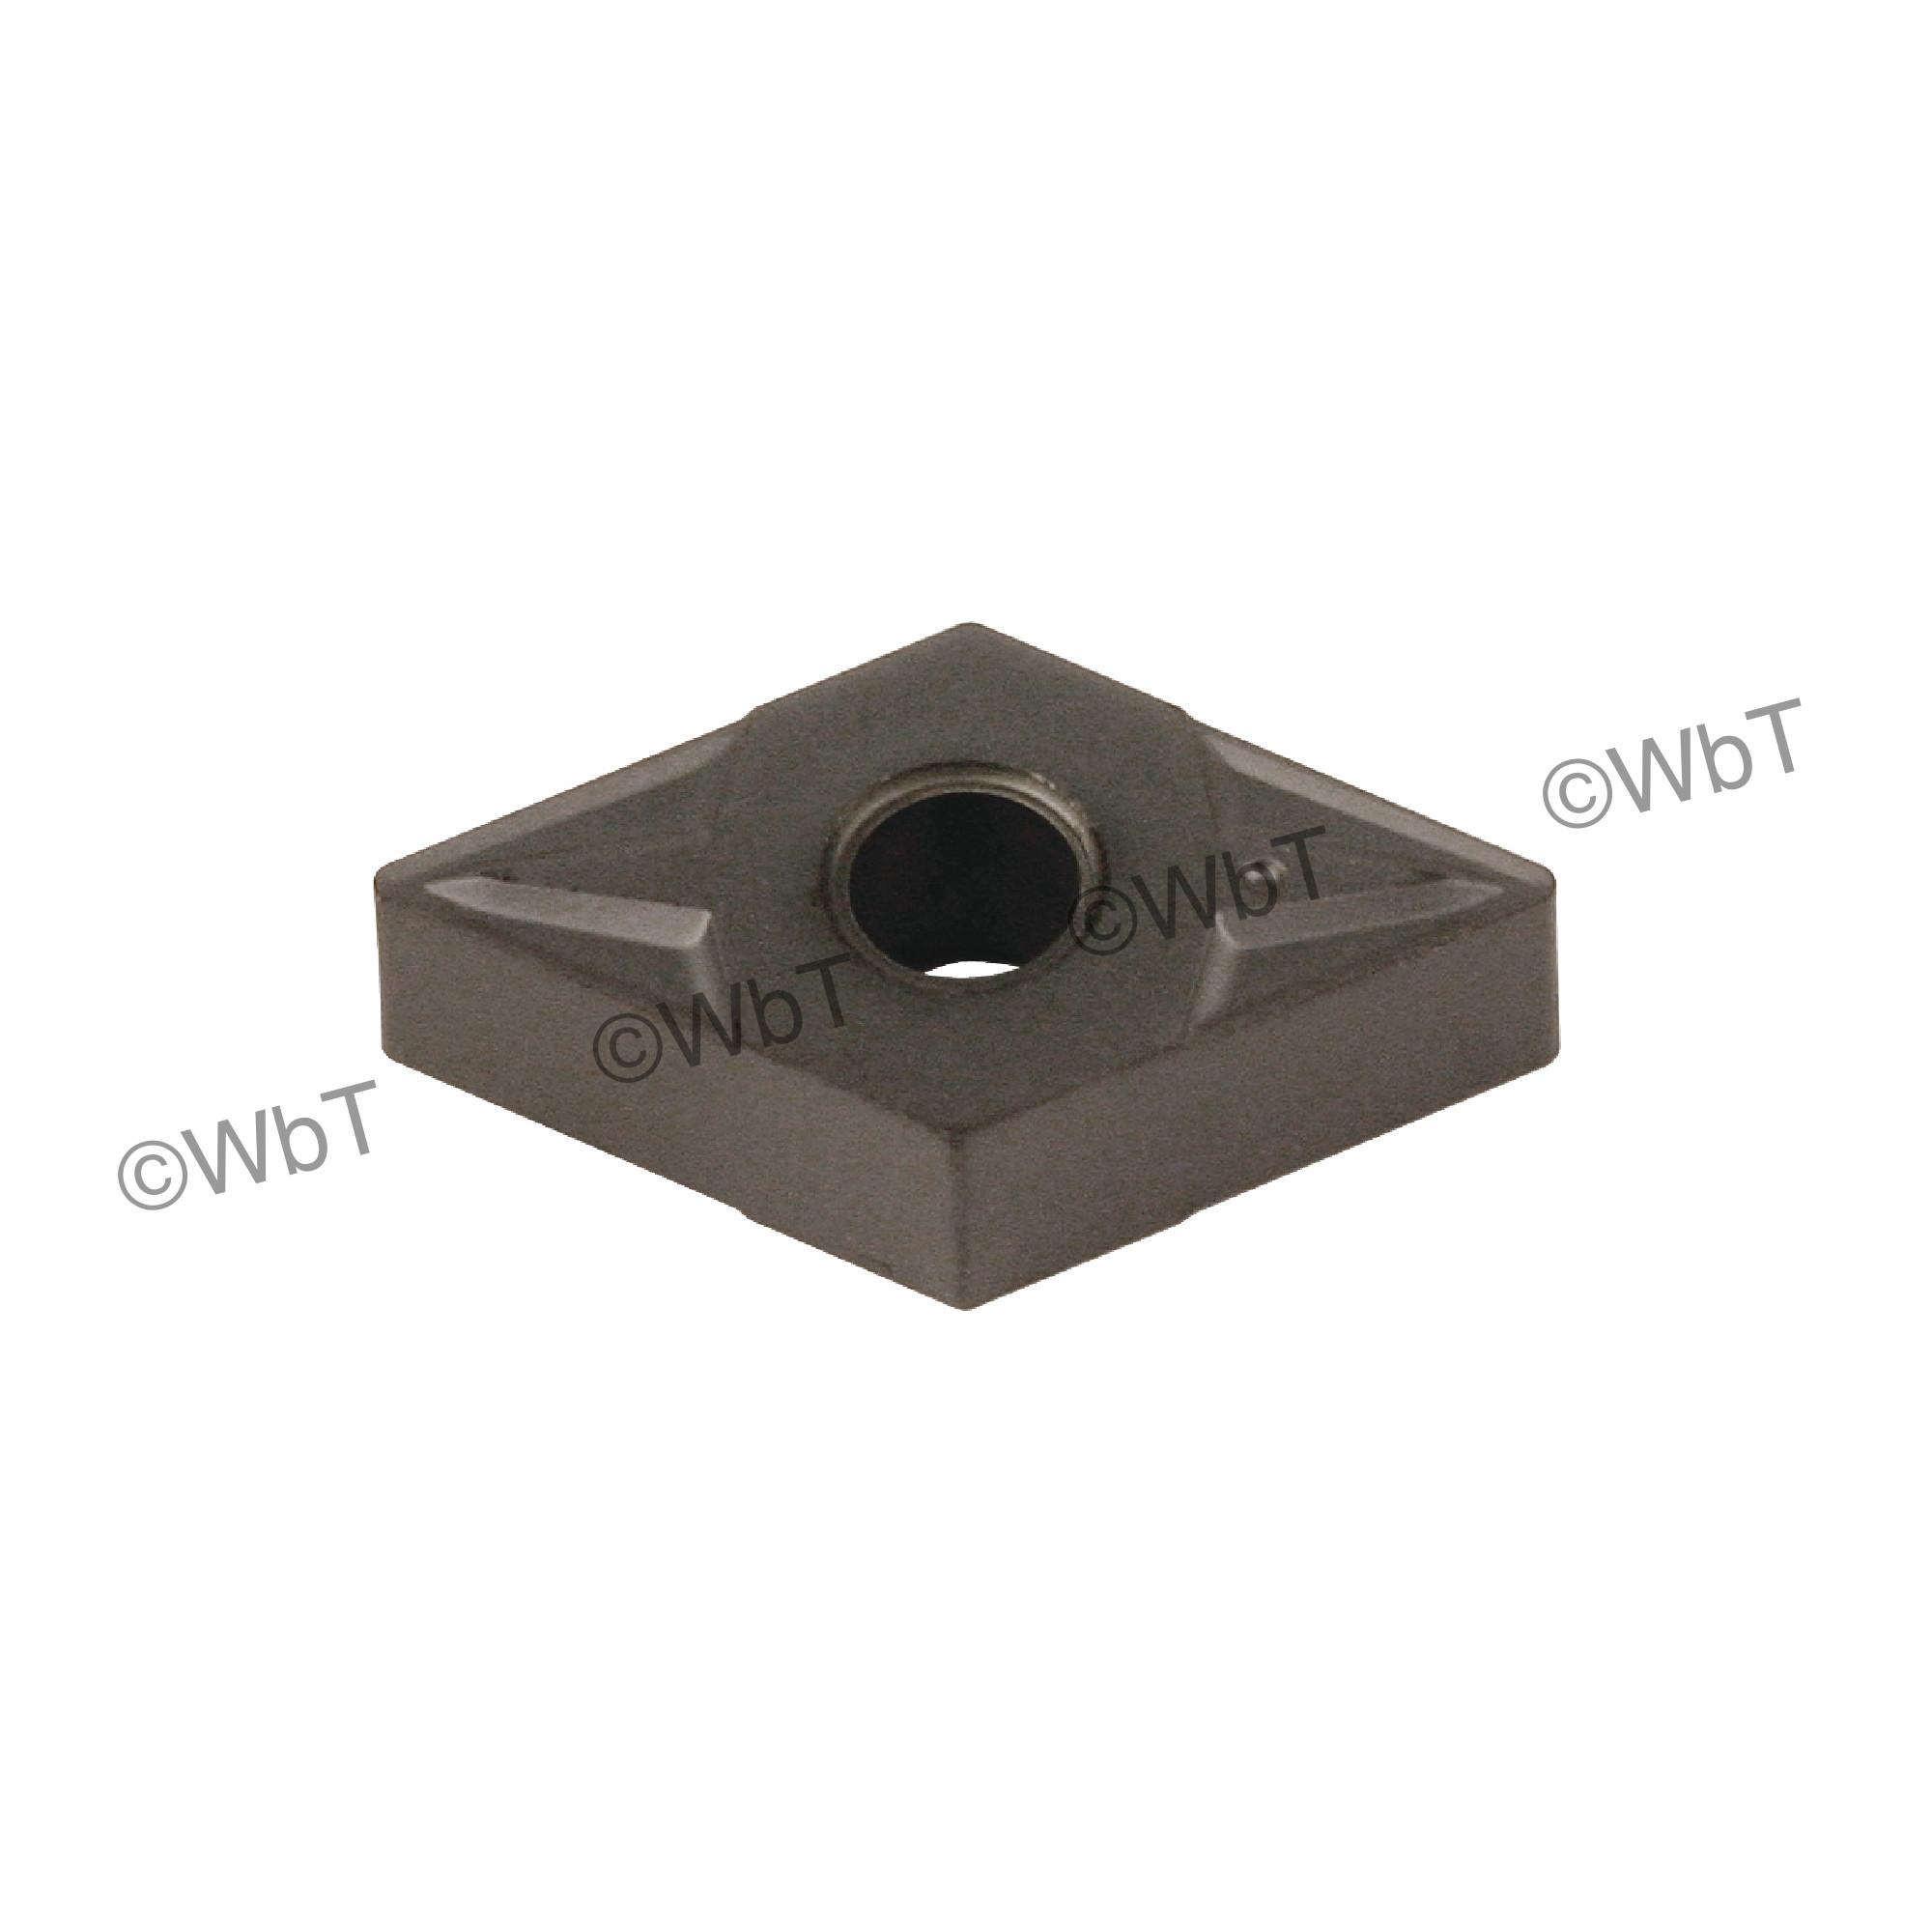 LAMINA - DNMG331-NN LT10 - 55° Diamond / Indexable Carbide Turning Insert